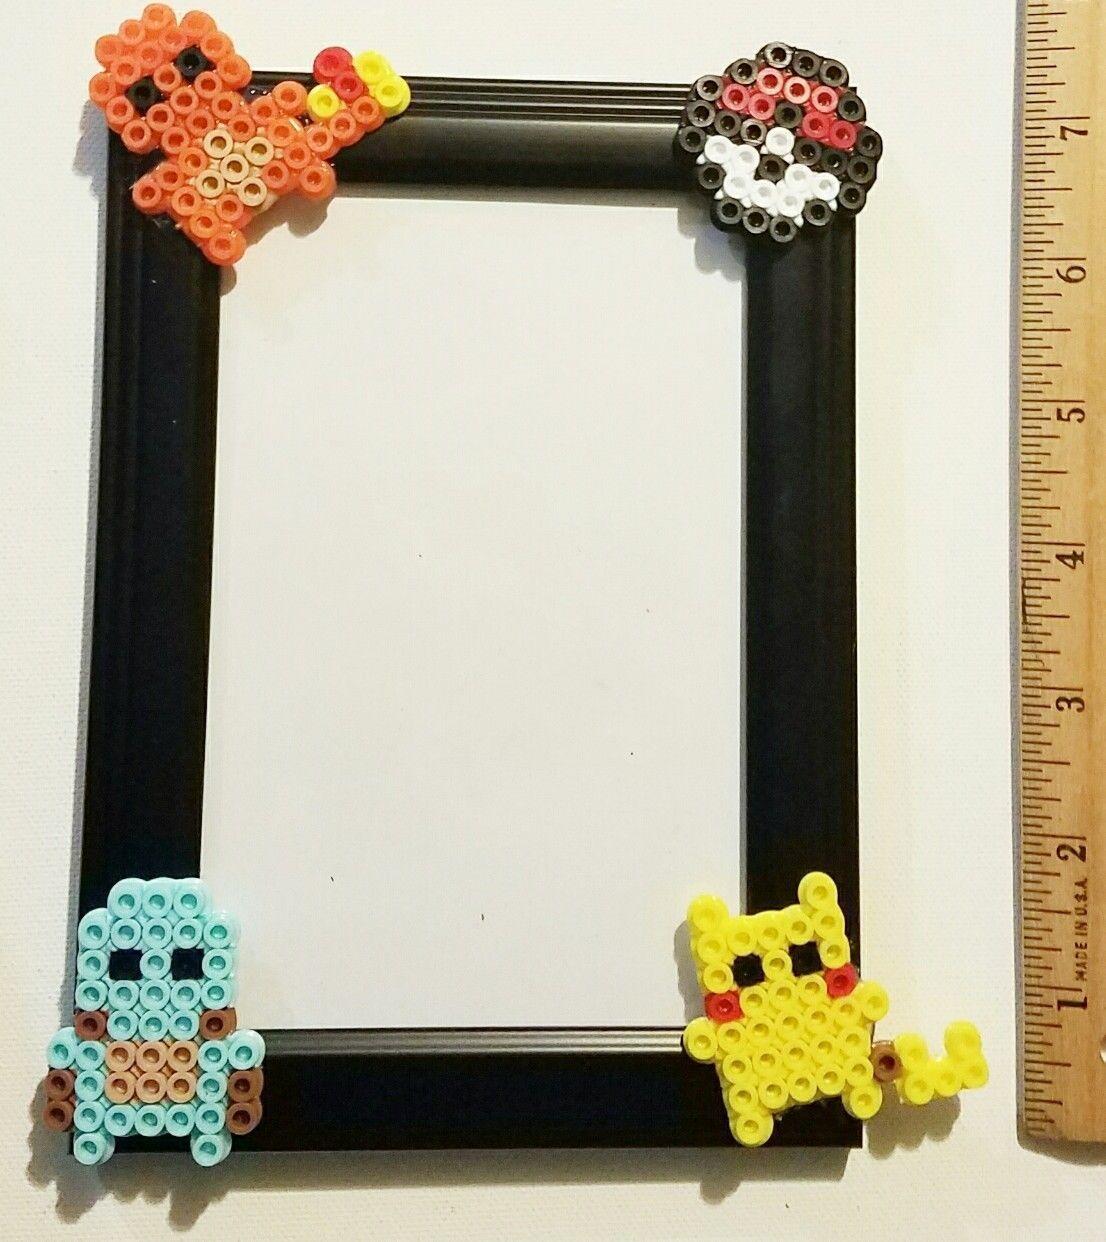 Pokemon Pikachu Charmander Squirtle Pokeball perler bead art